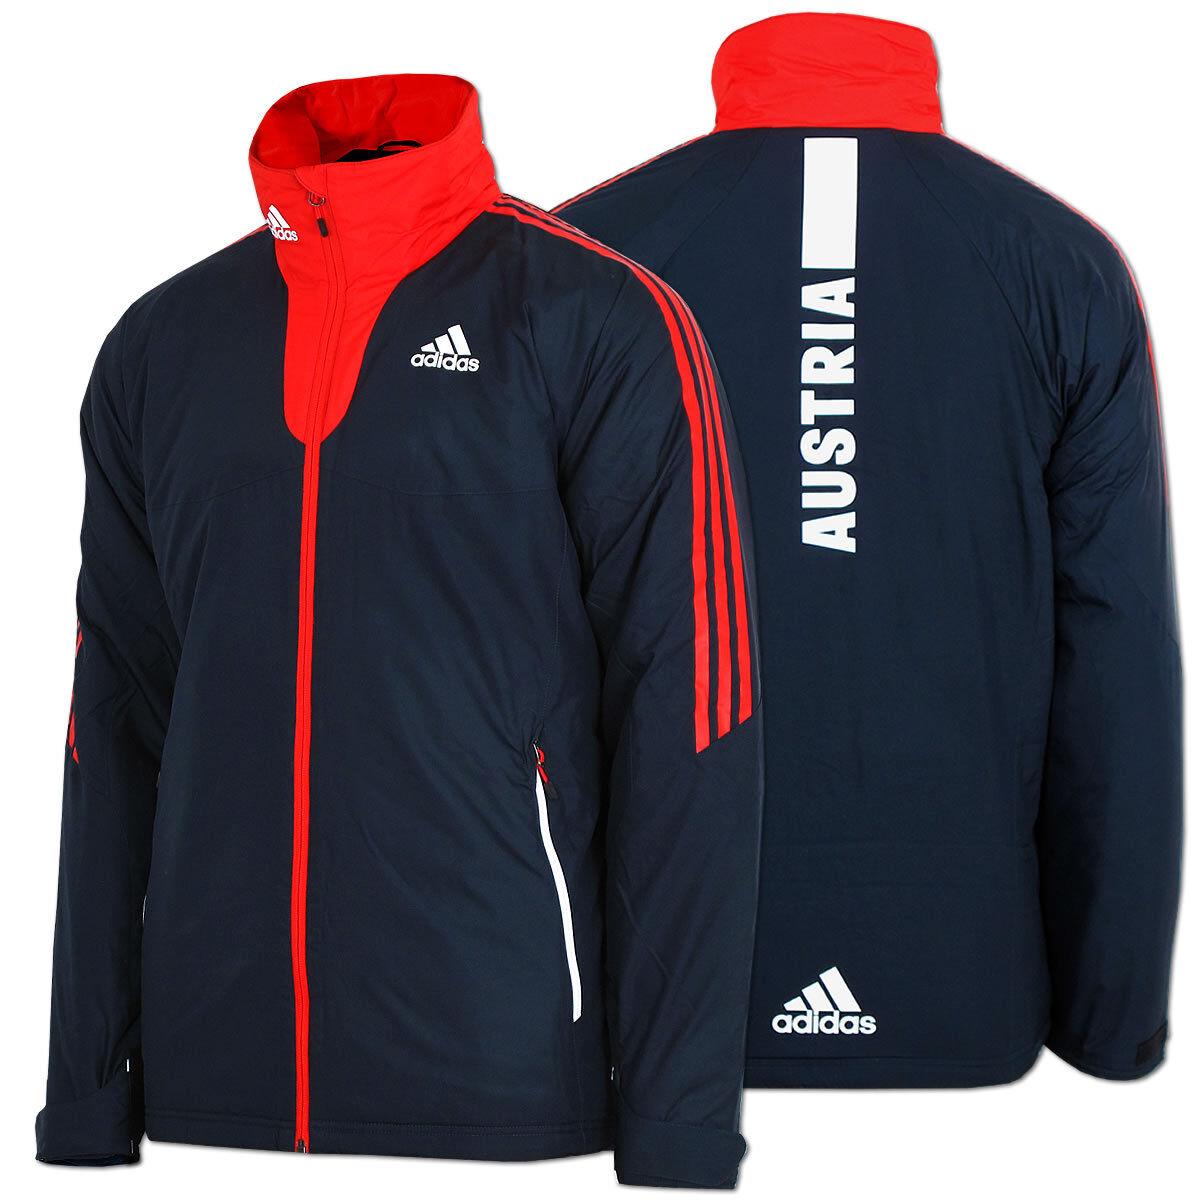 Adidas Herren Cross-Country Universal Jacke Team Austria Olympia Österreich ÖSV